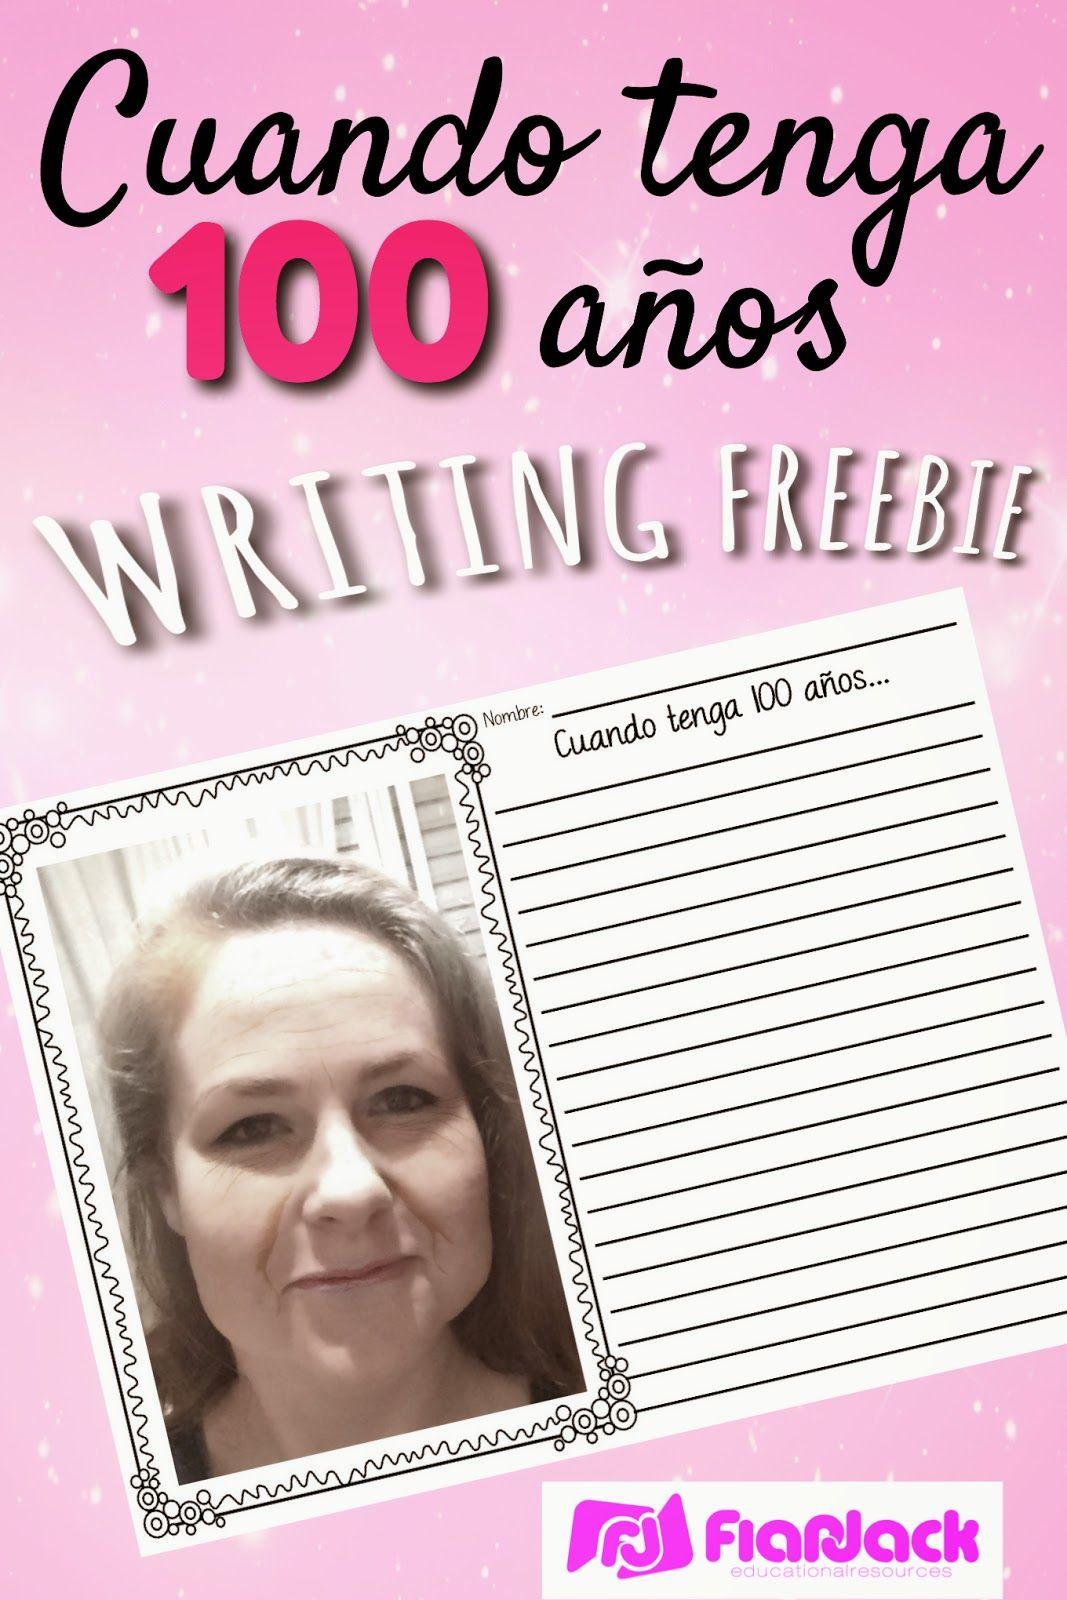 100 Years Old Spanish Writing Freebie